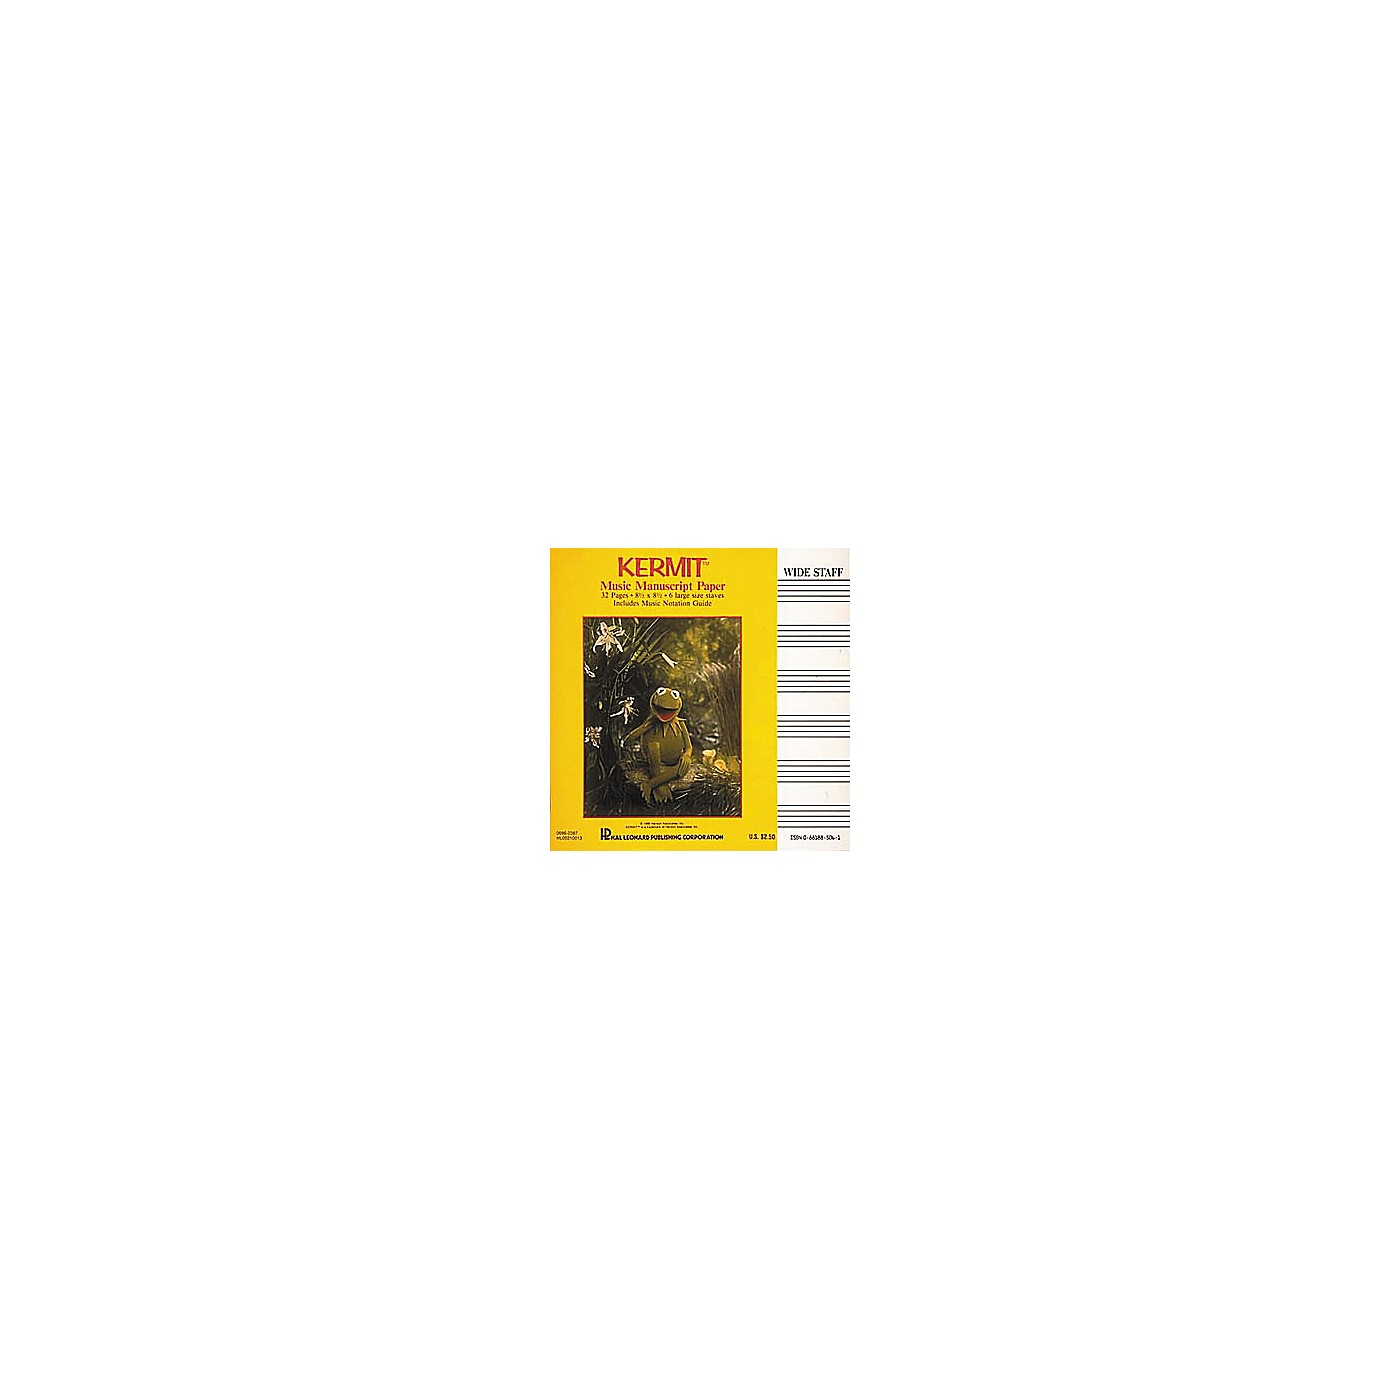 Hal Leonard Kermit The Frog Manuscript Paper Book thumbnail